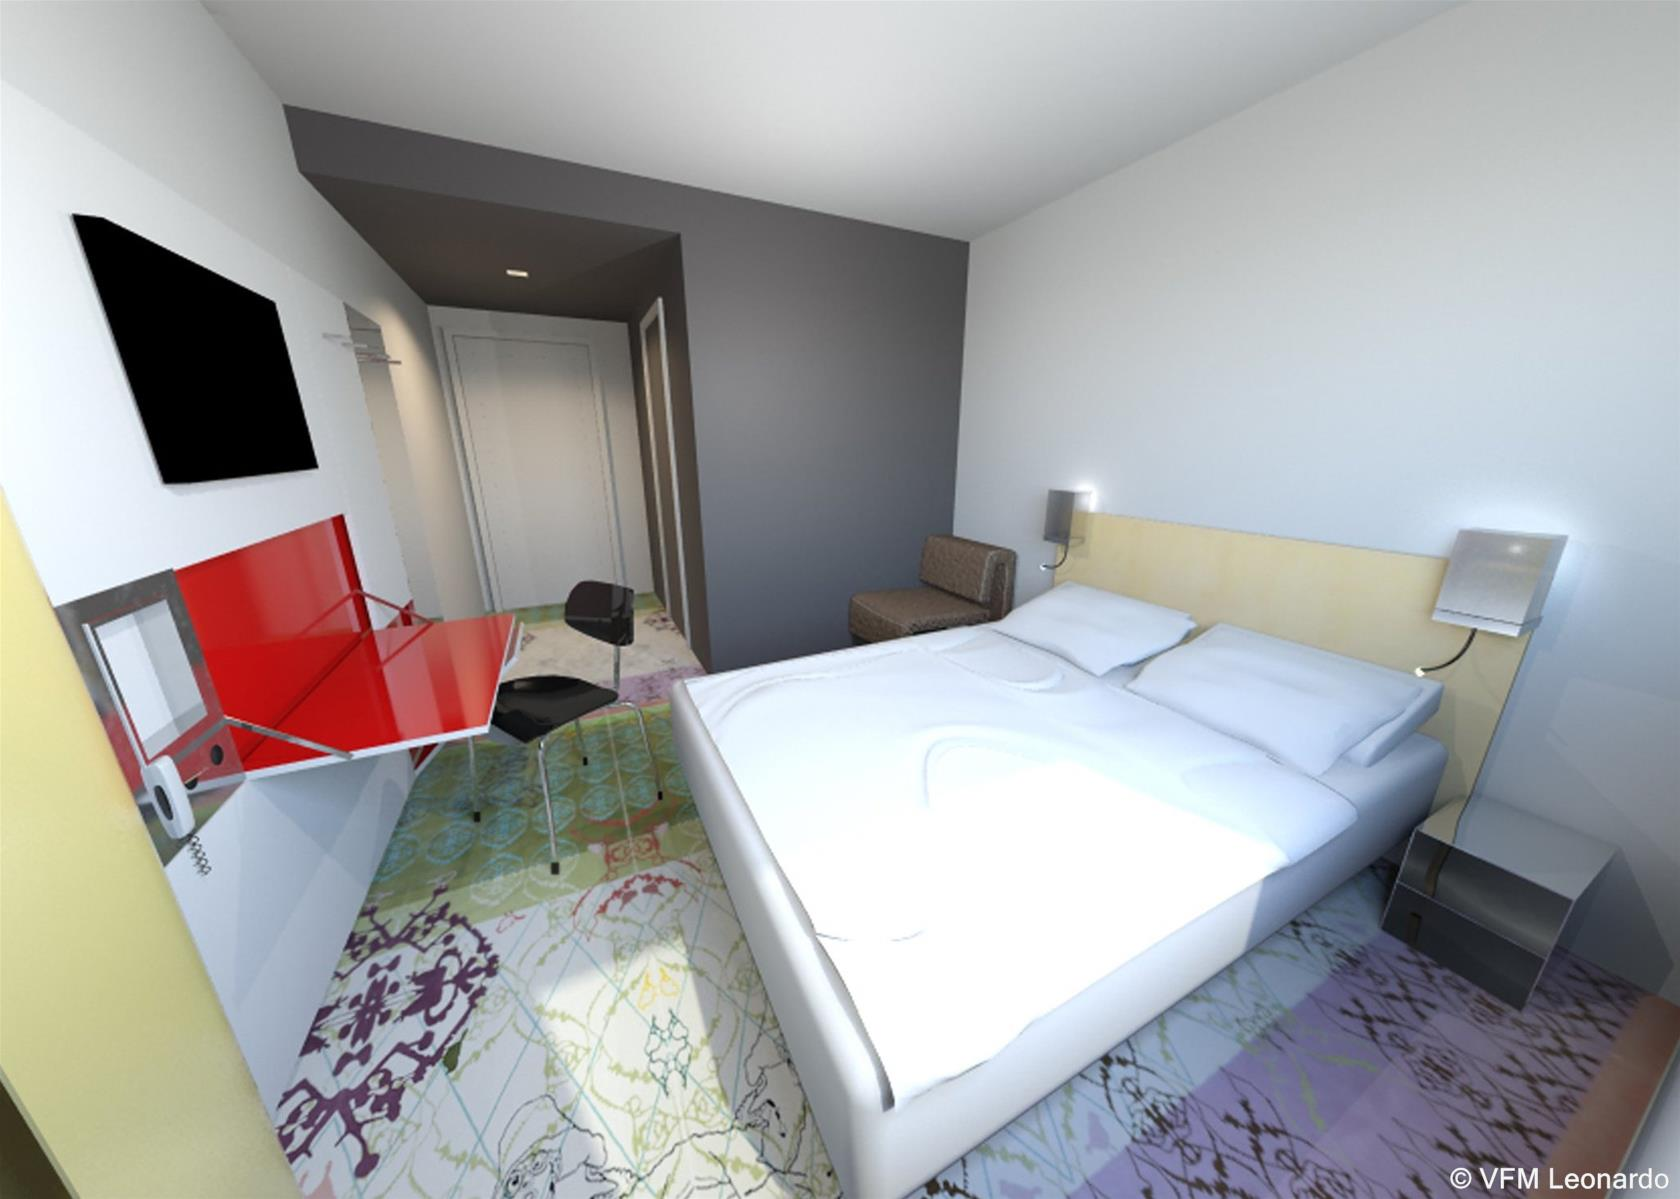 Comfort Hotel Xpress, Oslo